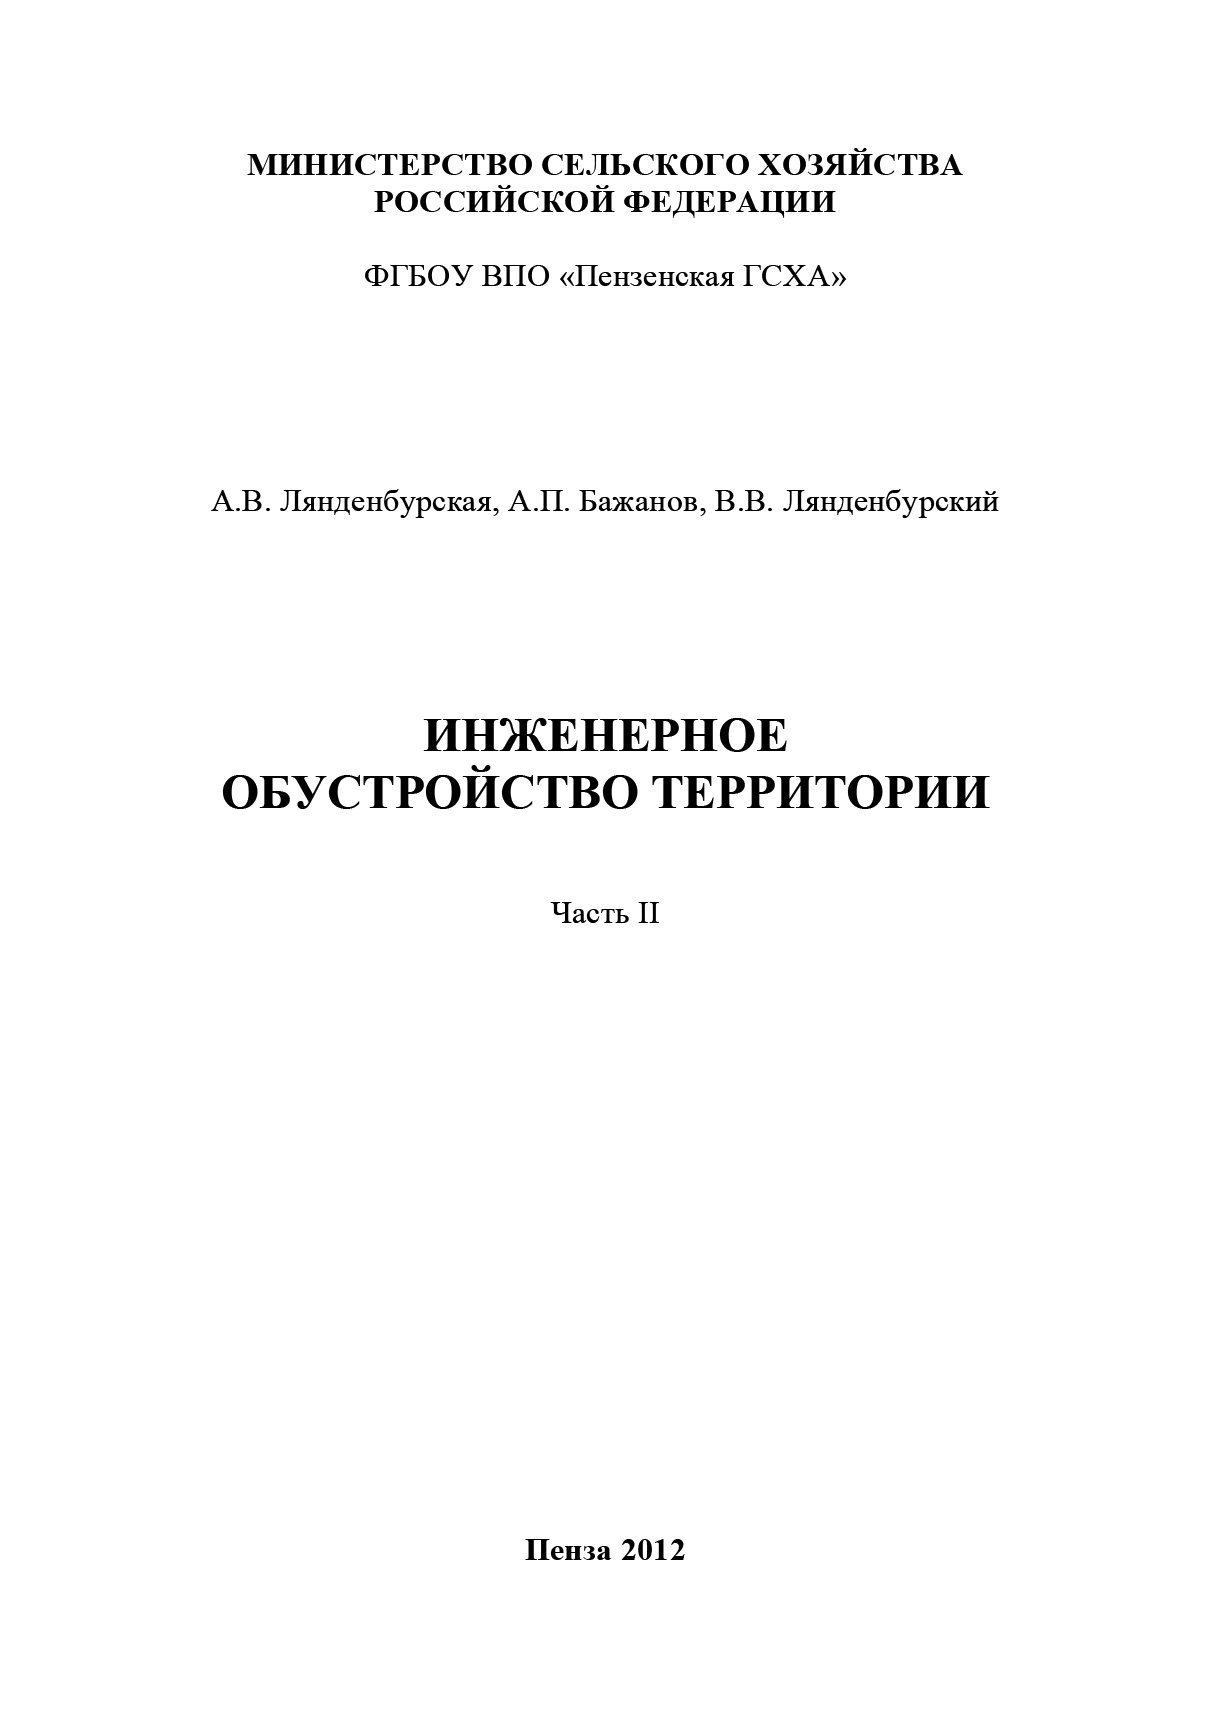 цена на А. П. Бажанов Инженерное обустройство территории. Часть II